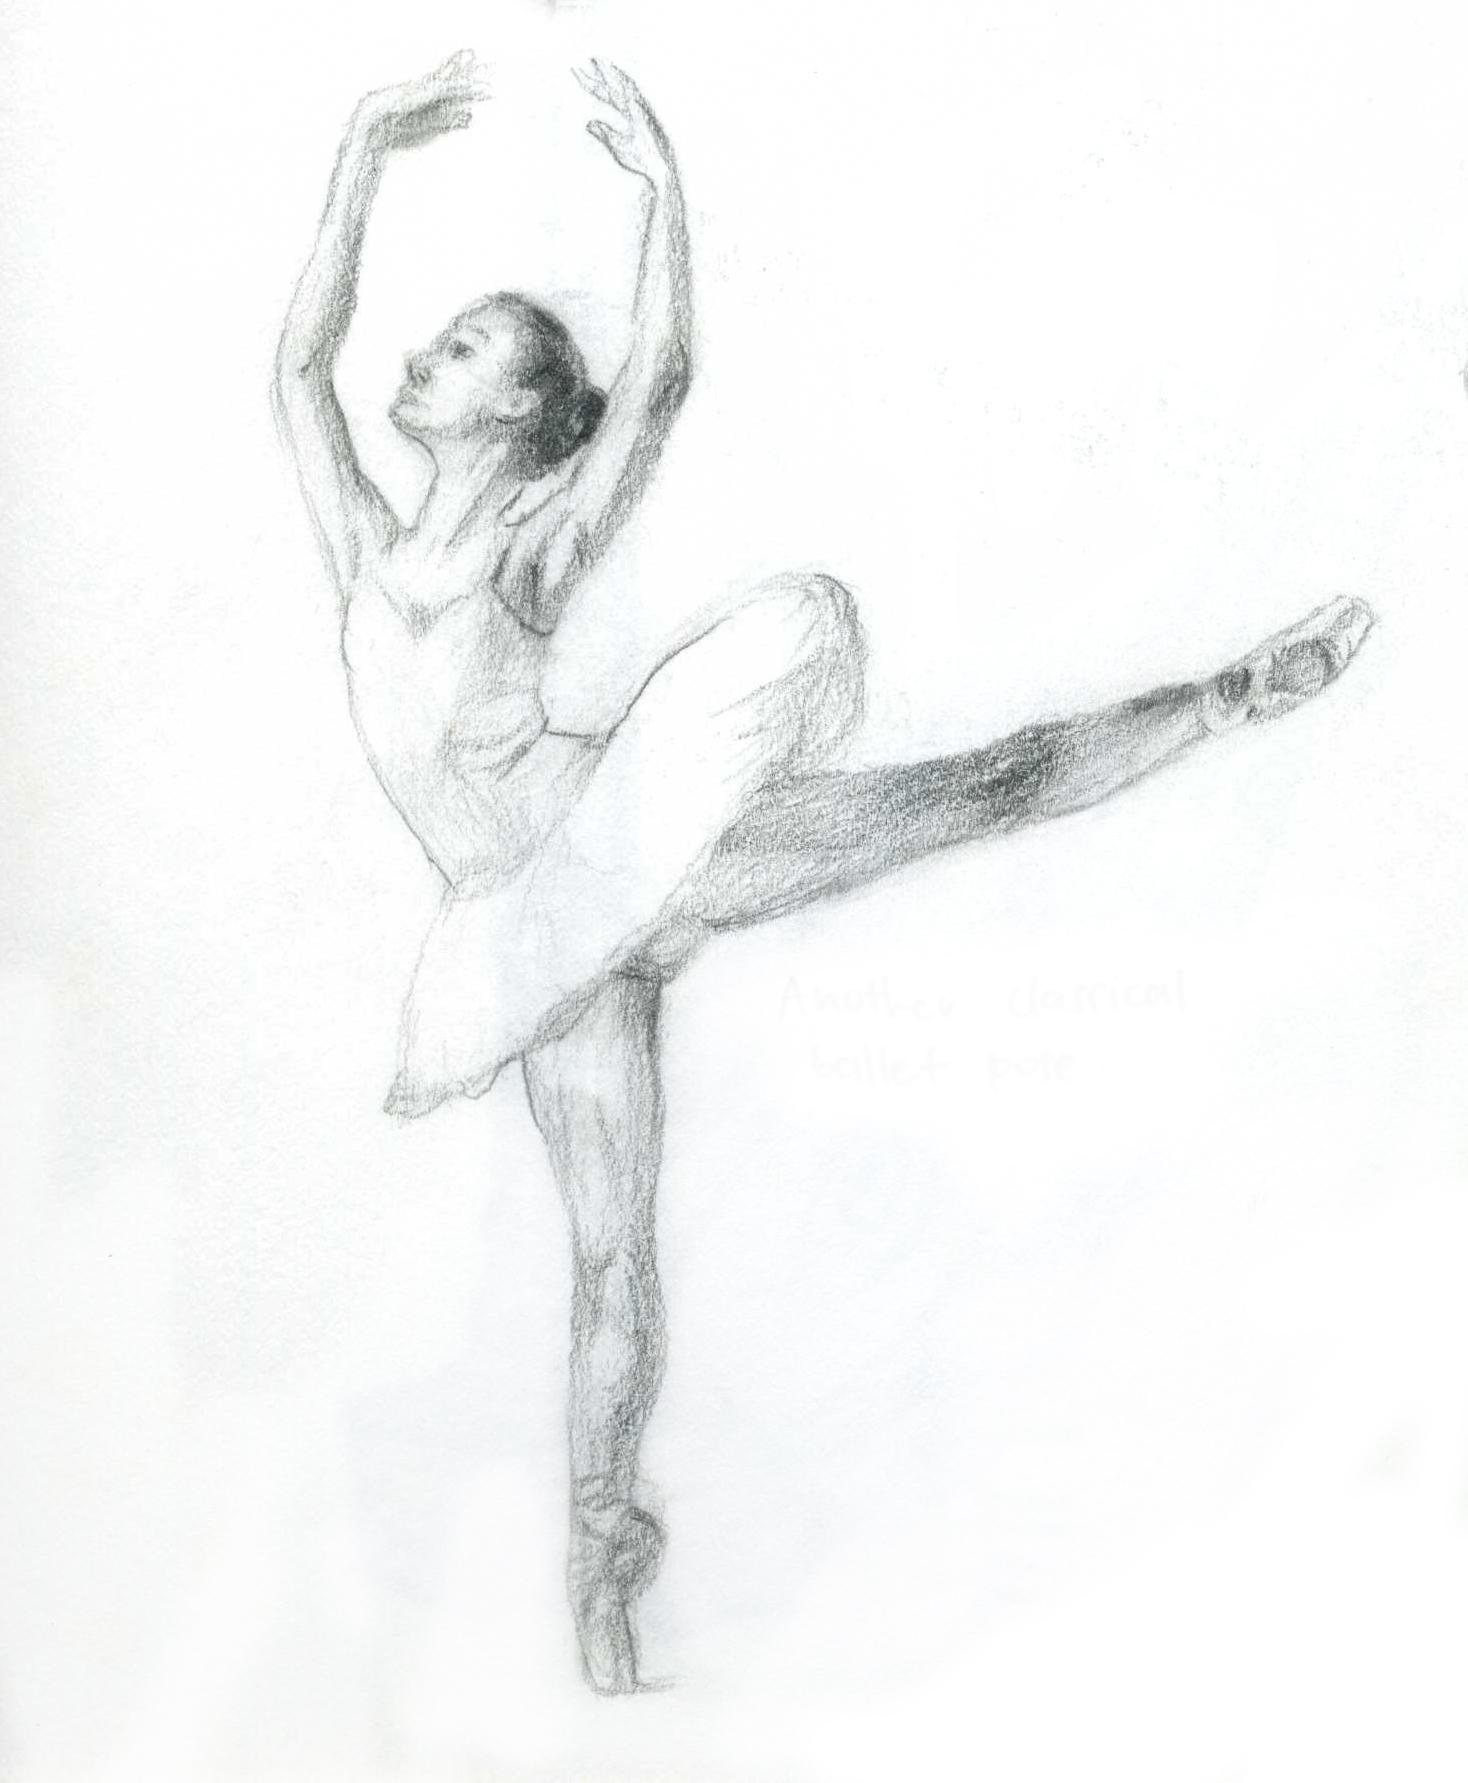 Drawn ballerine sketch Of Sketches  dancers